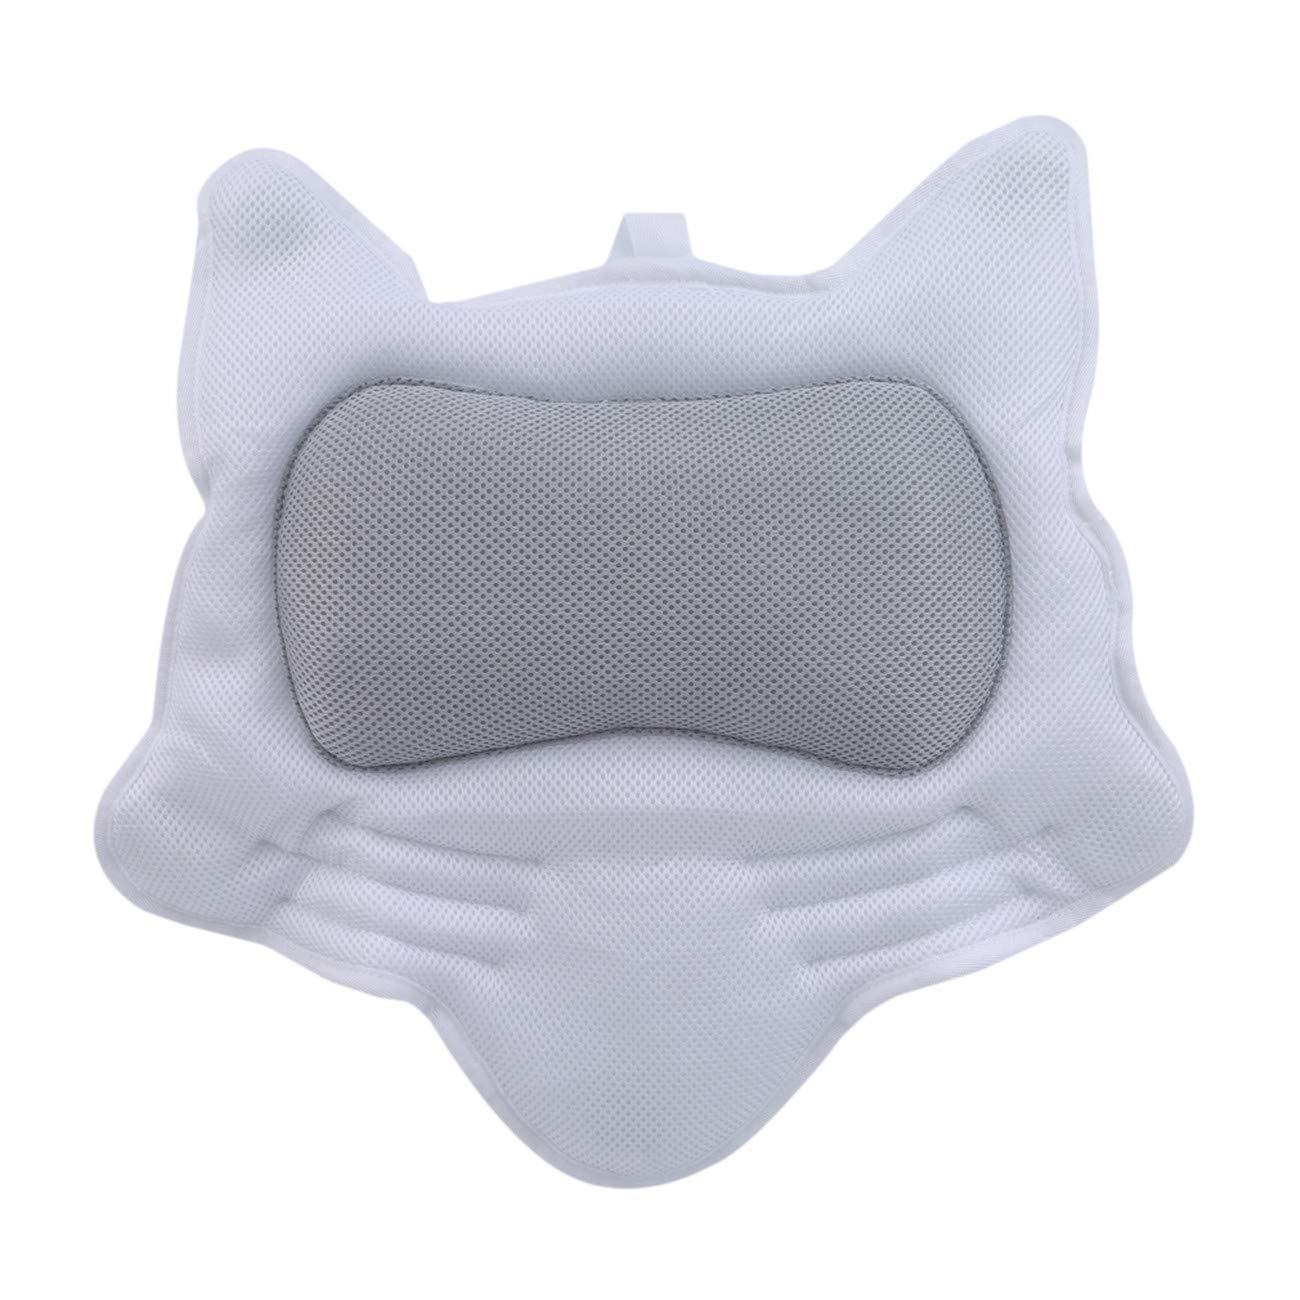 ZALING Thickened Bath latest Pillow Soft Headrest Max 90% OFF Wi SPA Bathtub